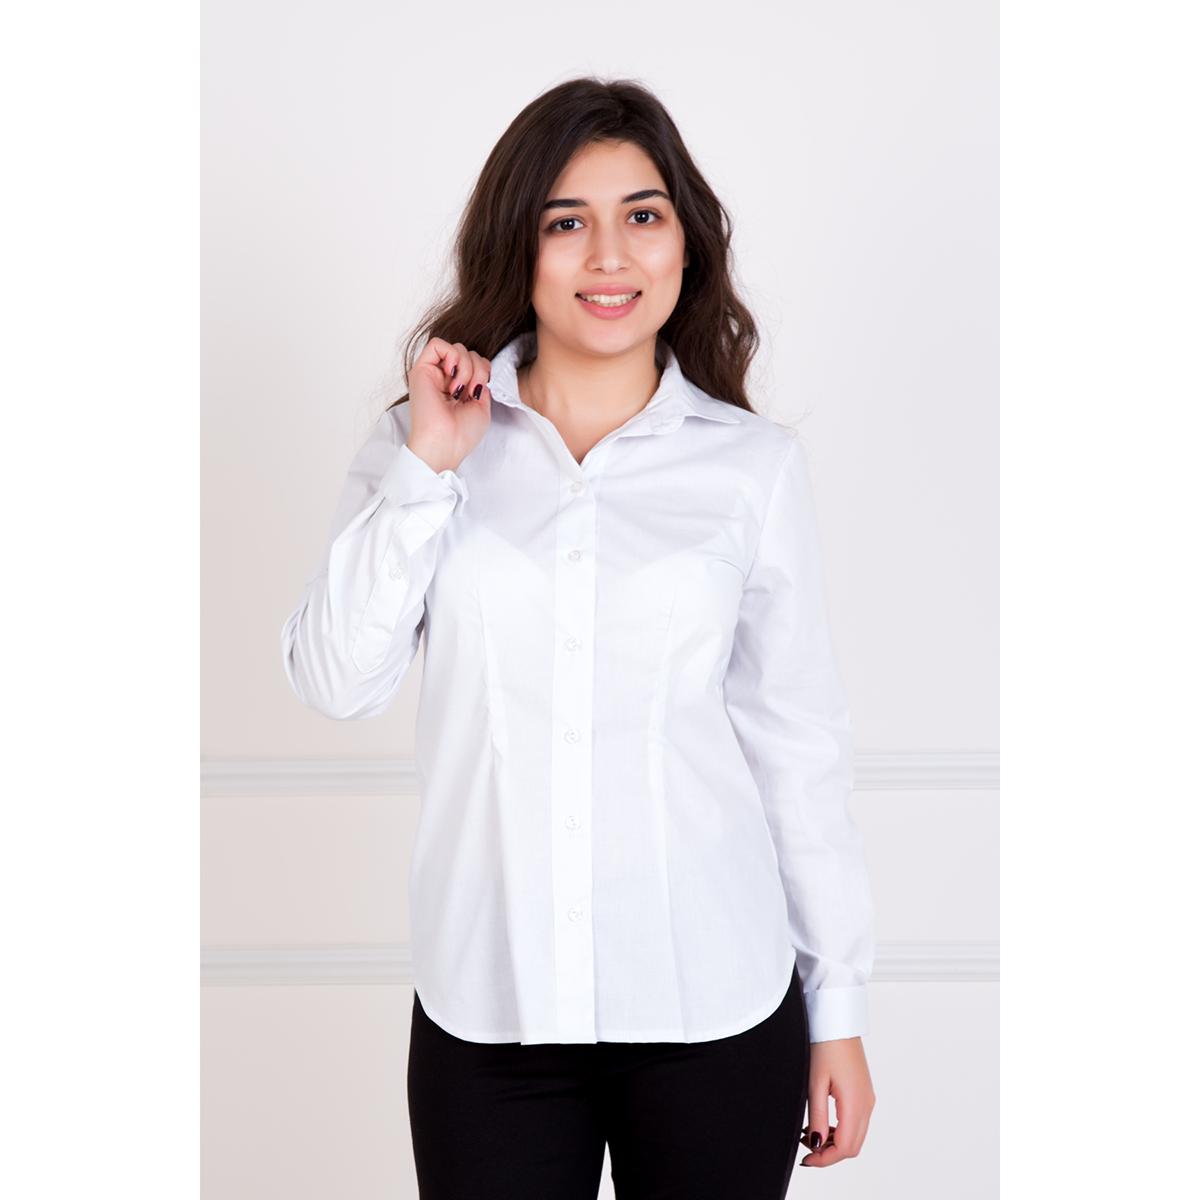 Женская рубашка Герда, размер 46Рубашки<br>Обхват груди:92 см<br>Обхват талии:74 см<br>Обхват бедер:100 см<br>Рост:167 см<br><br>Тип: Жен. рубашка<br>Размер: 46<br>Материал: Хлопок